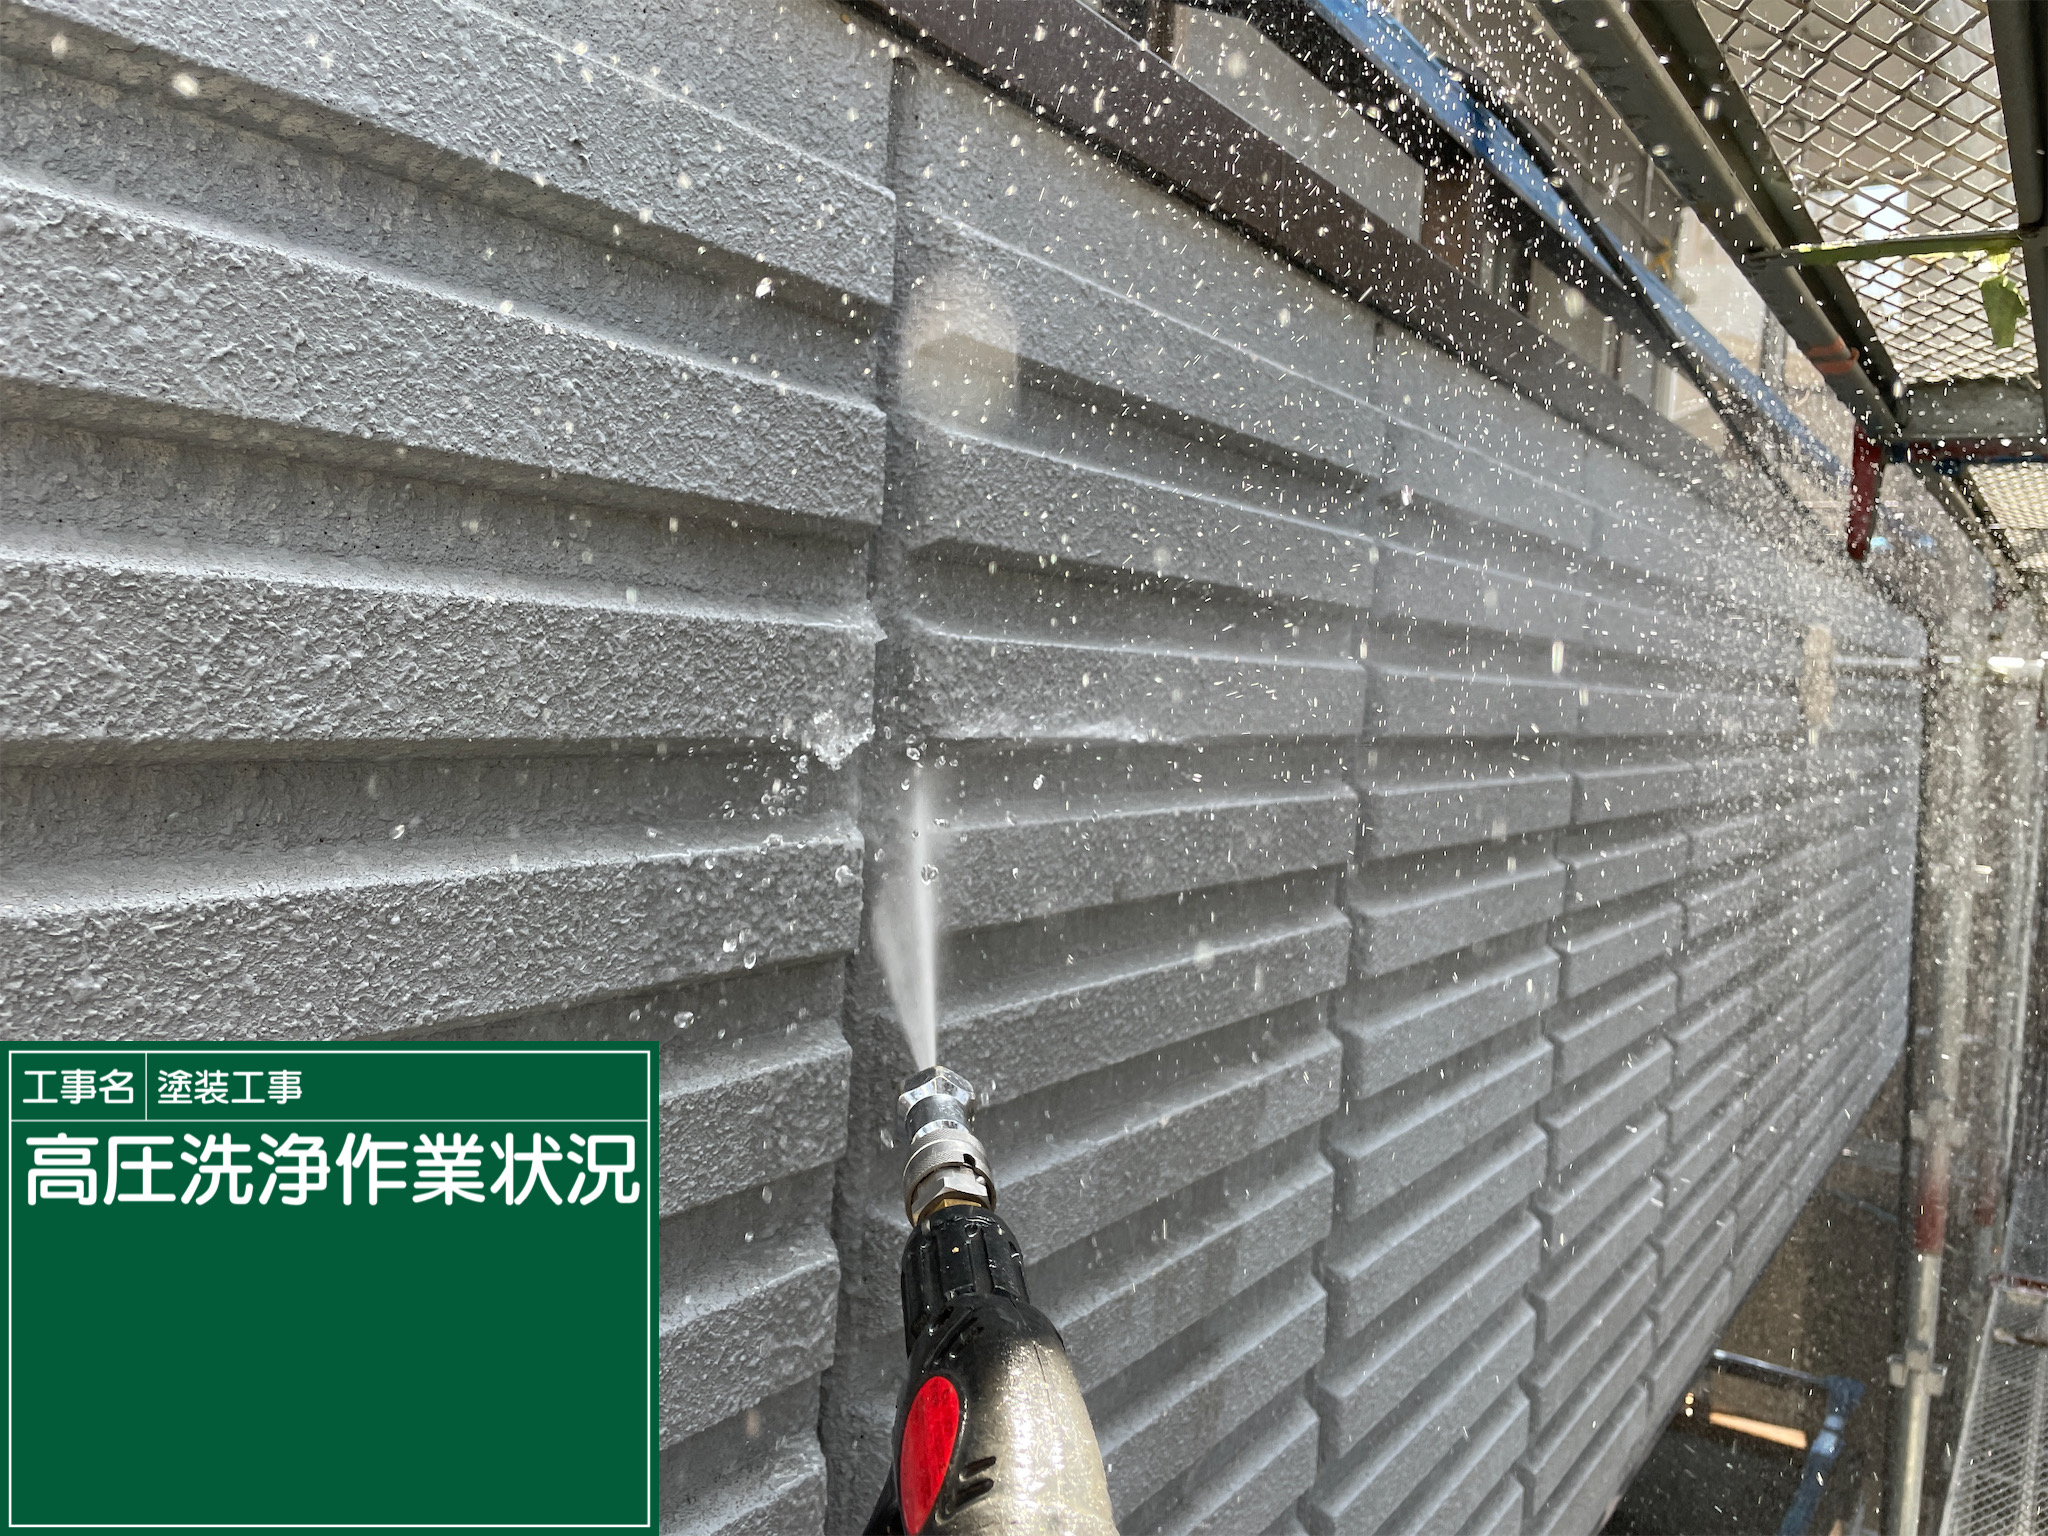 ハナマル!高圧洗浄!【外壁塗装 越谷 埼玉】